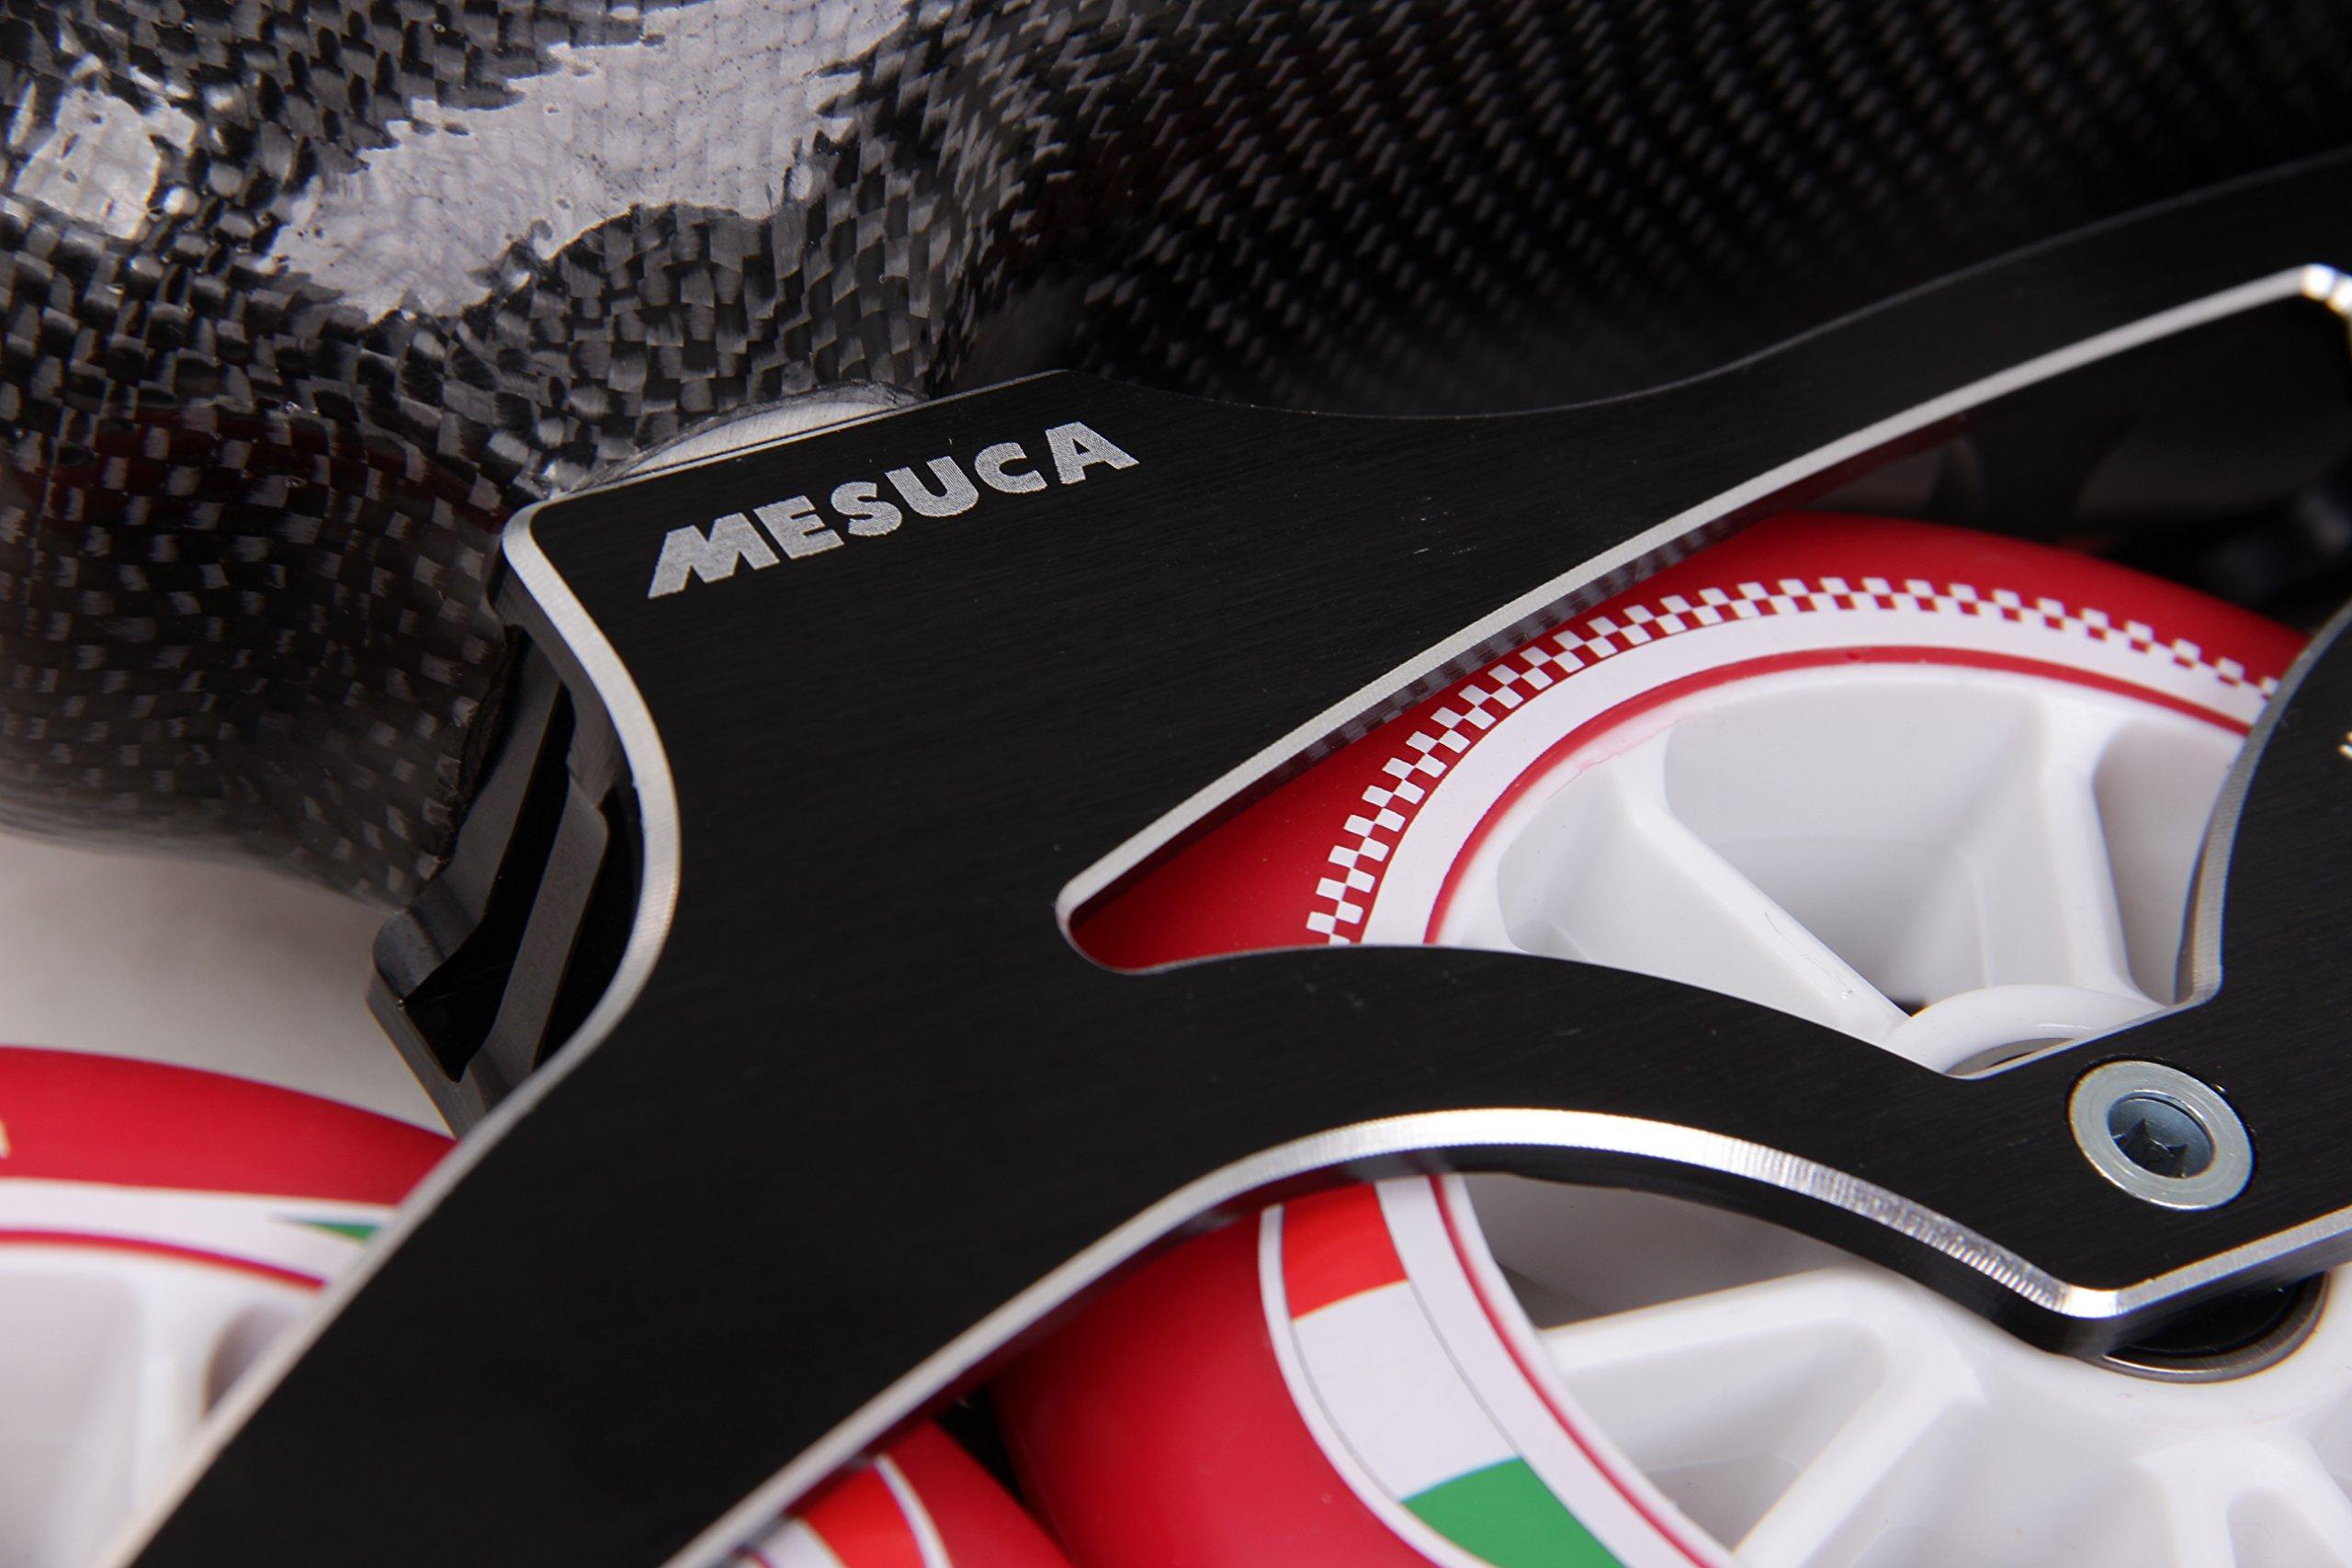 Ferrari FS81 Speed Skate Carbon Fiber Inline Skate Racing Skate Size 41 For Adults X Sports